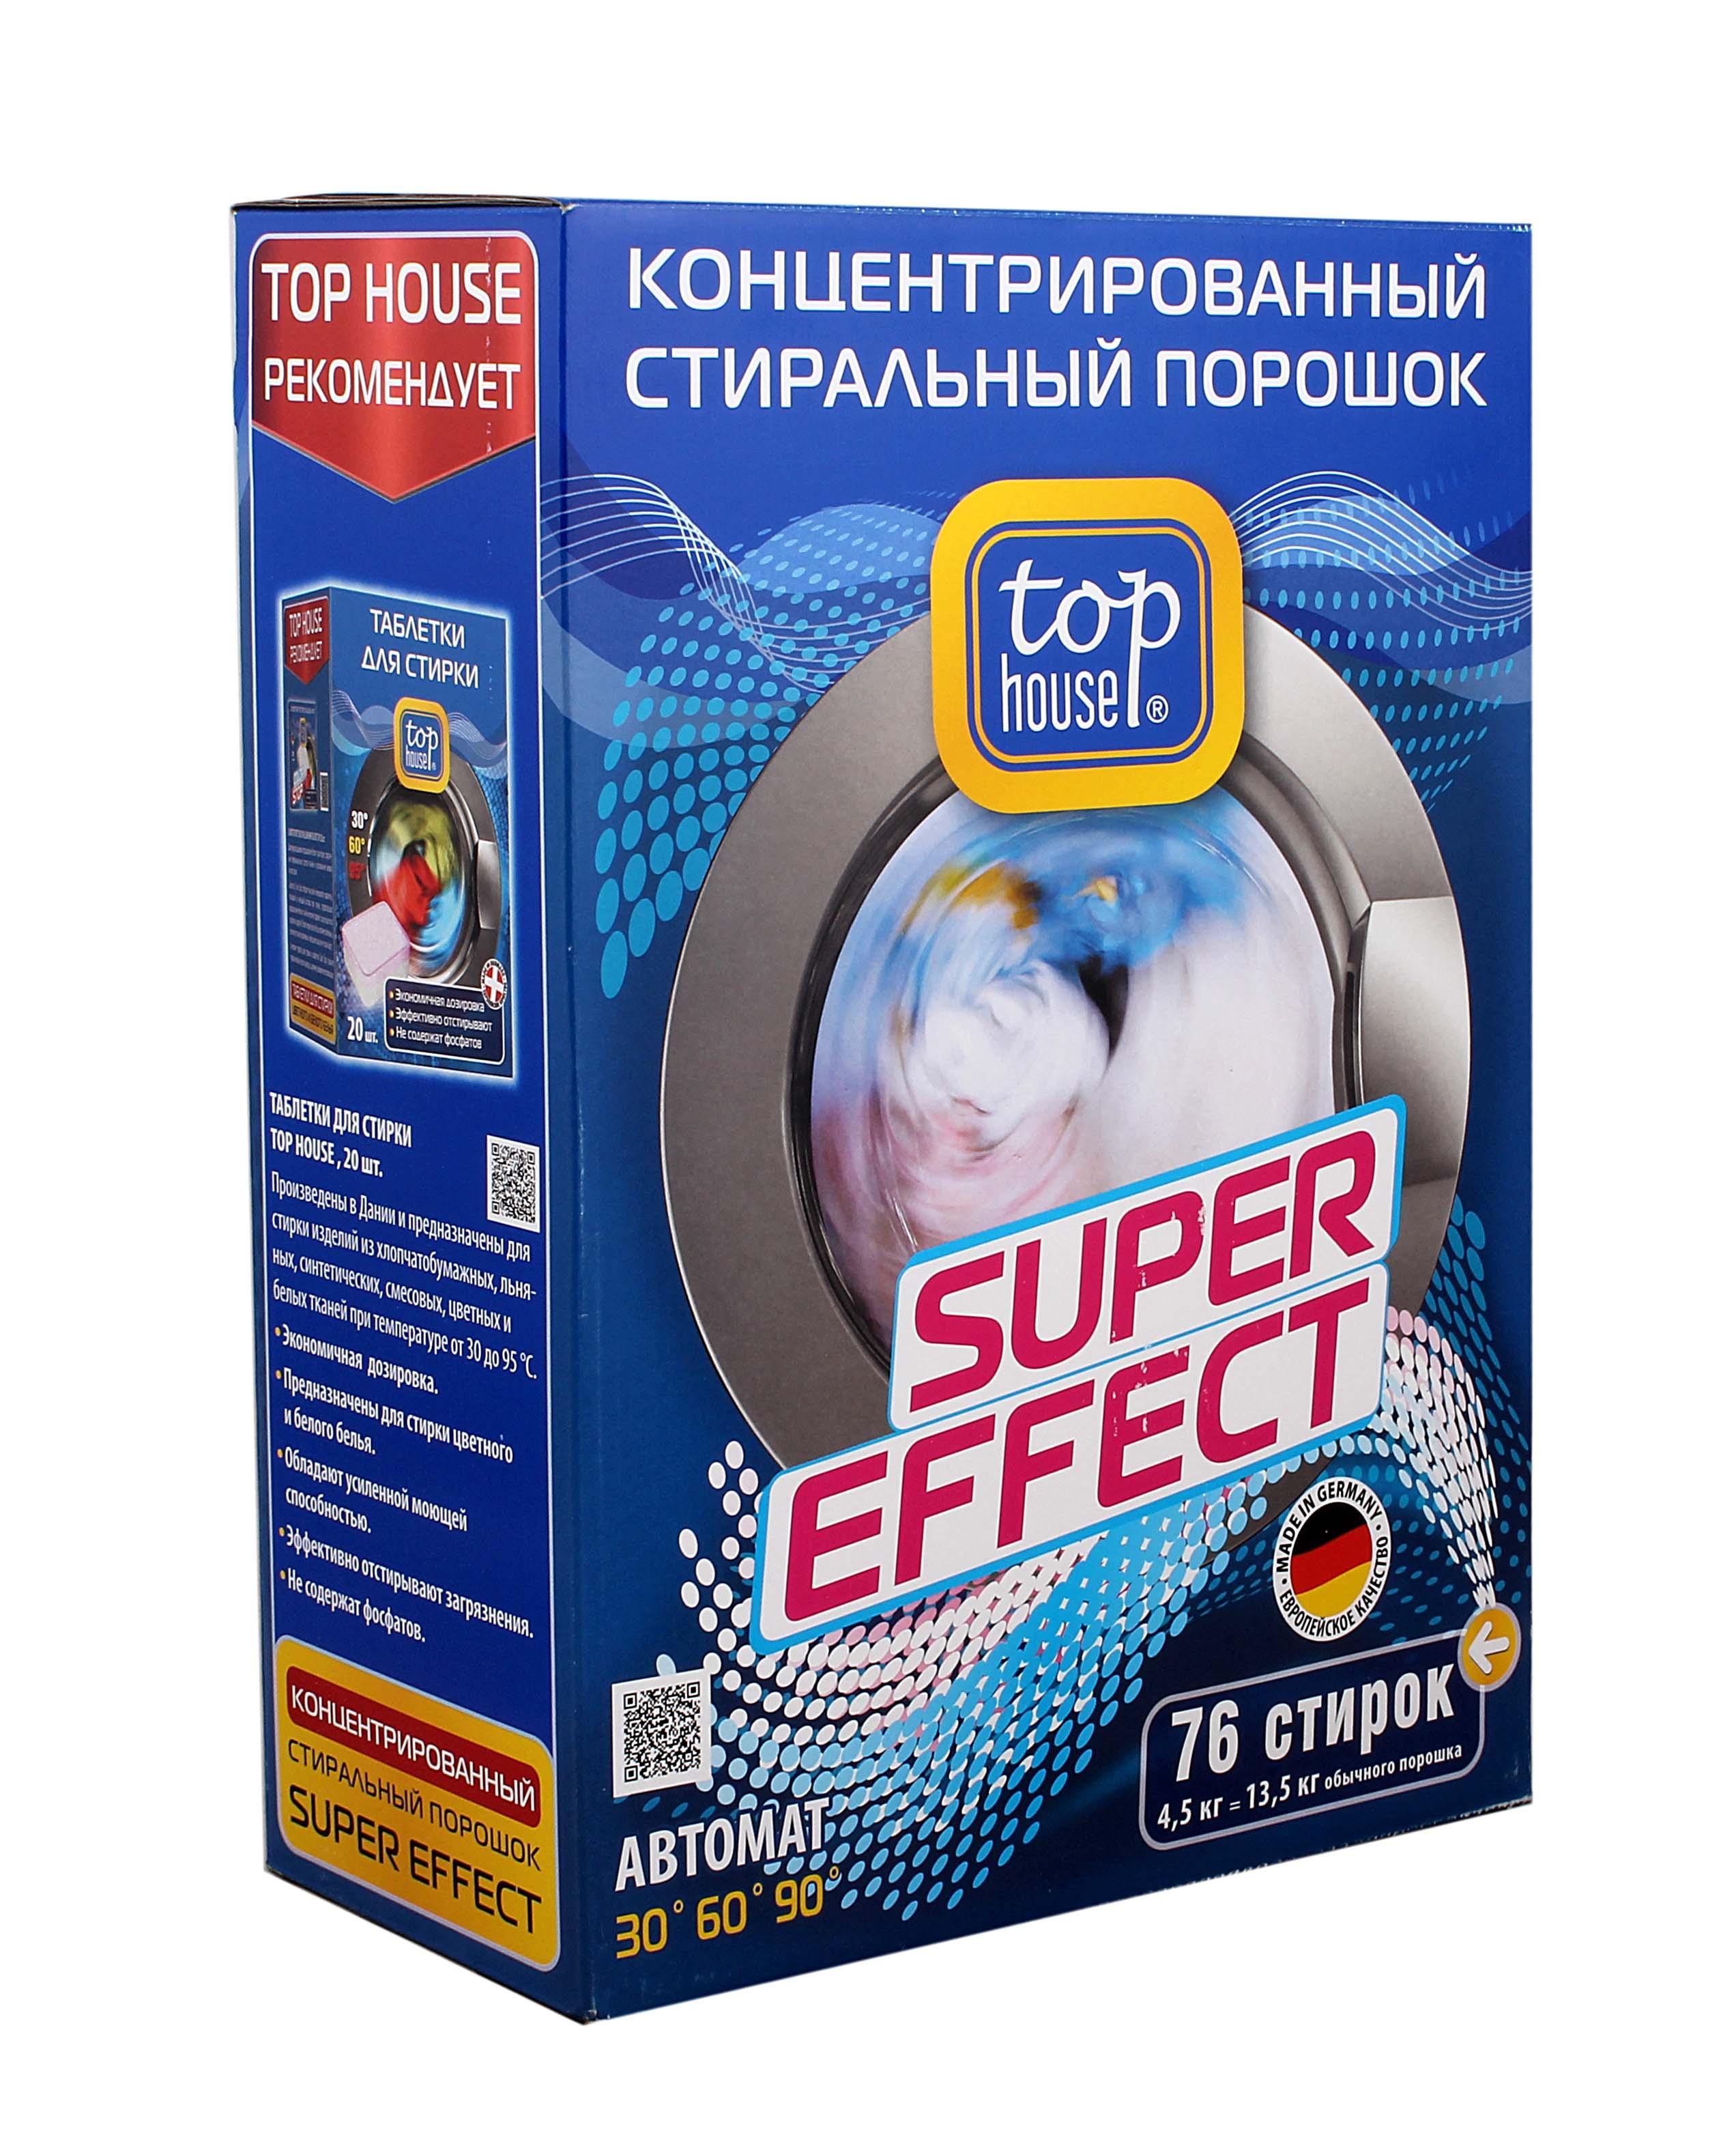 Средства для стирки и от накипи Топ хаус Real Brand Technics 949.000